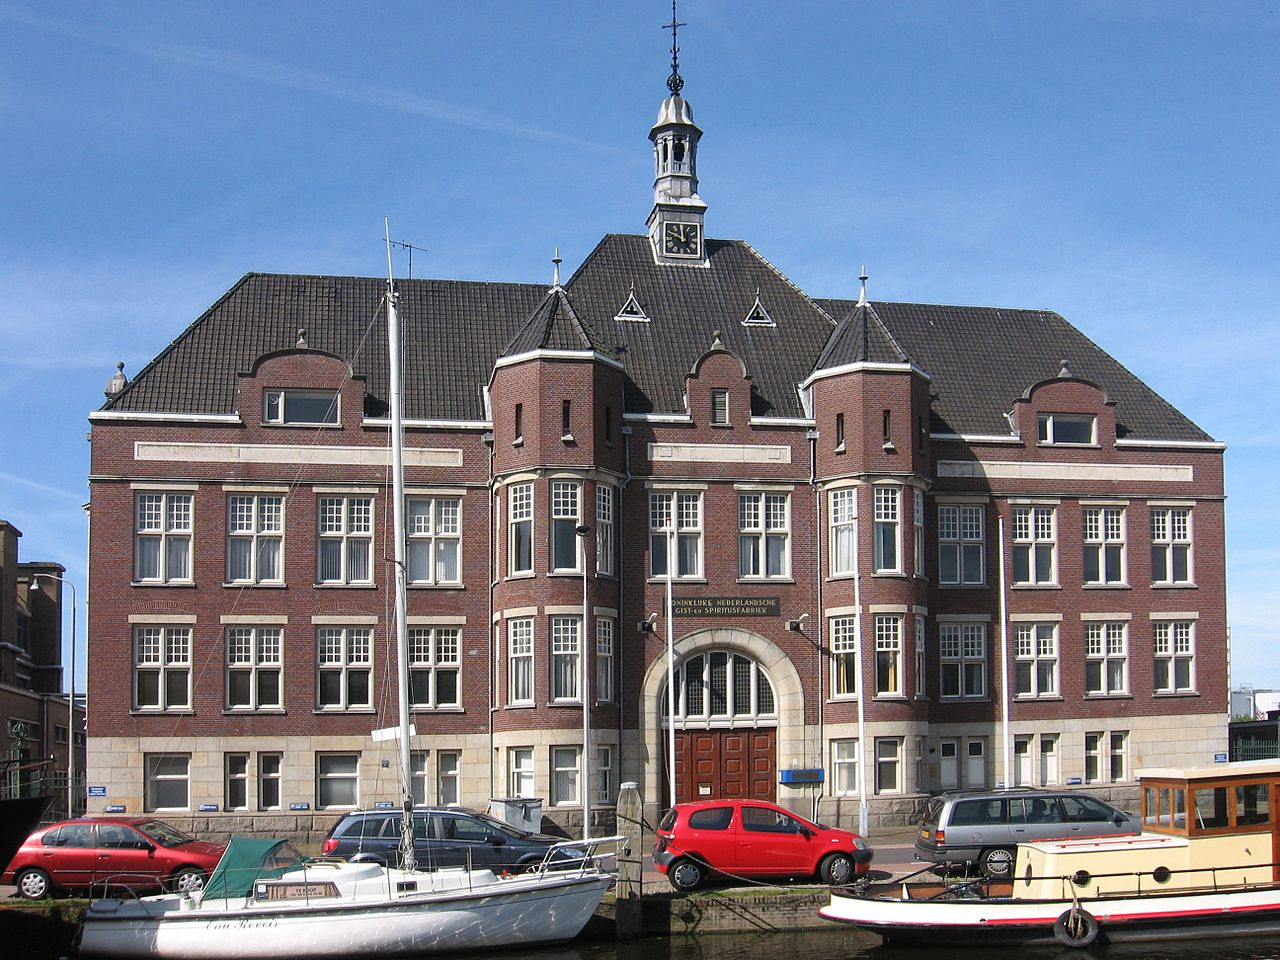 _koninklijke_nederlandse_gist-_en_spiritusfabriek_-gistfabriek-_-mm-minderhoud